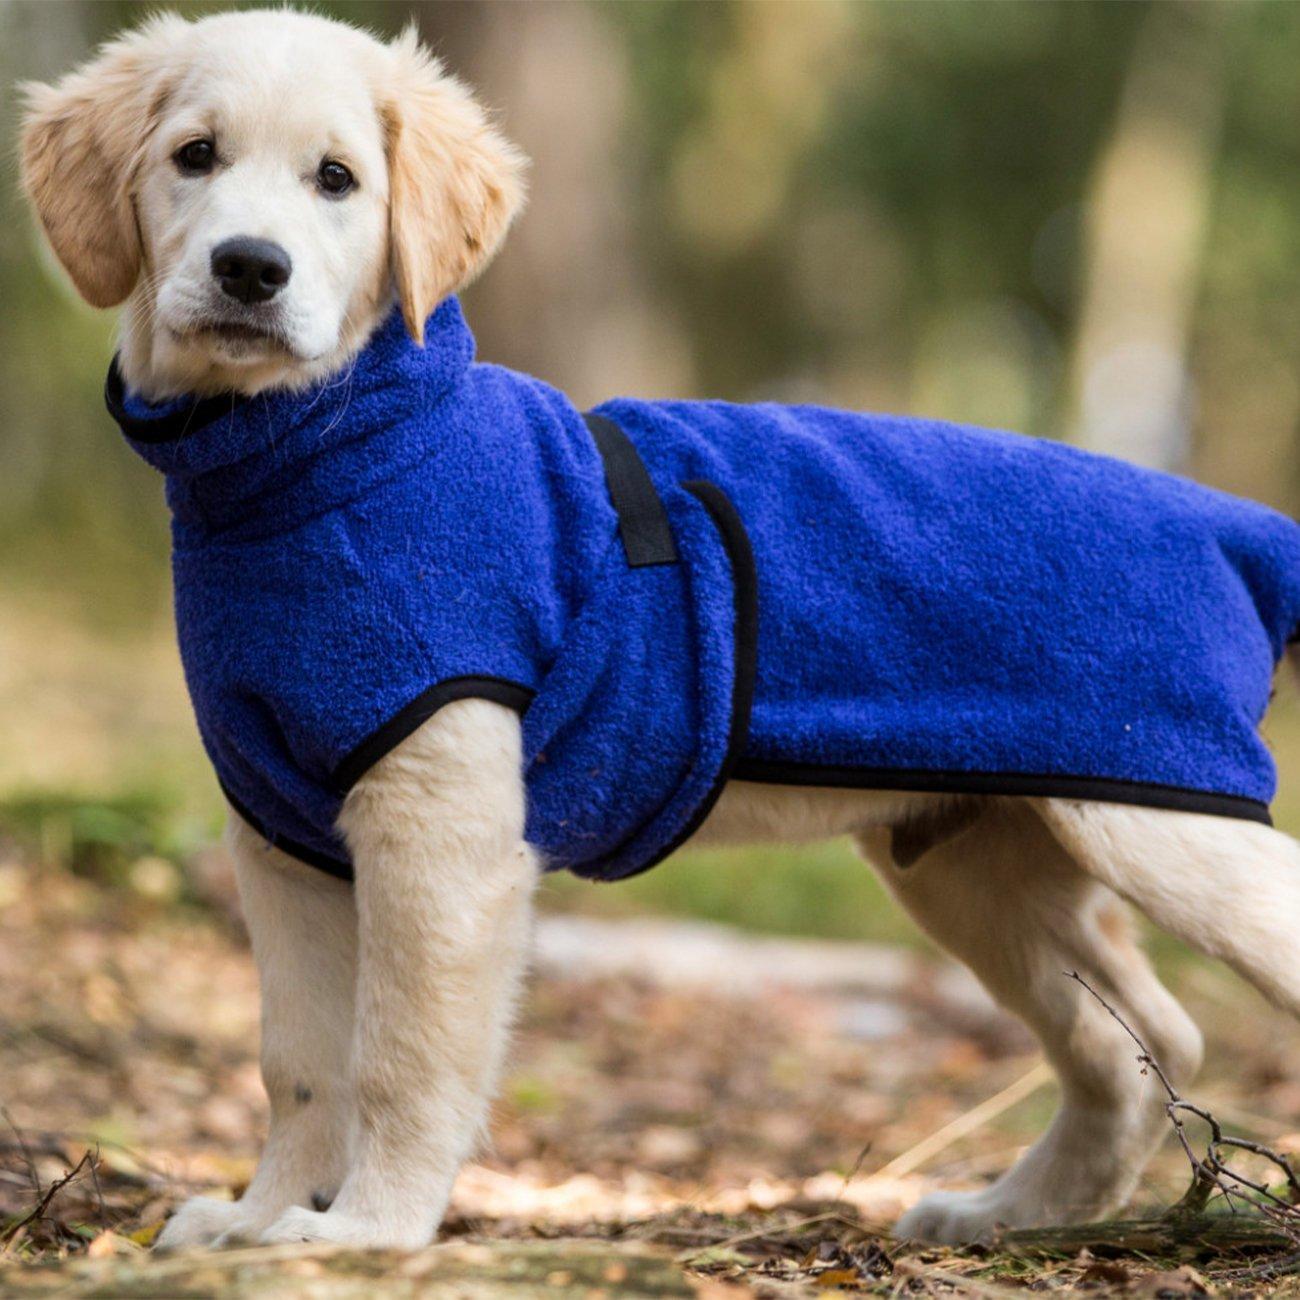 ActionFactory fit4dogs Dryup Mini Trockenmantel für Hunde, Bild 3